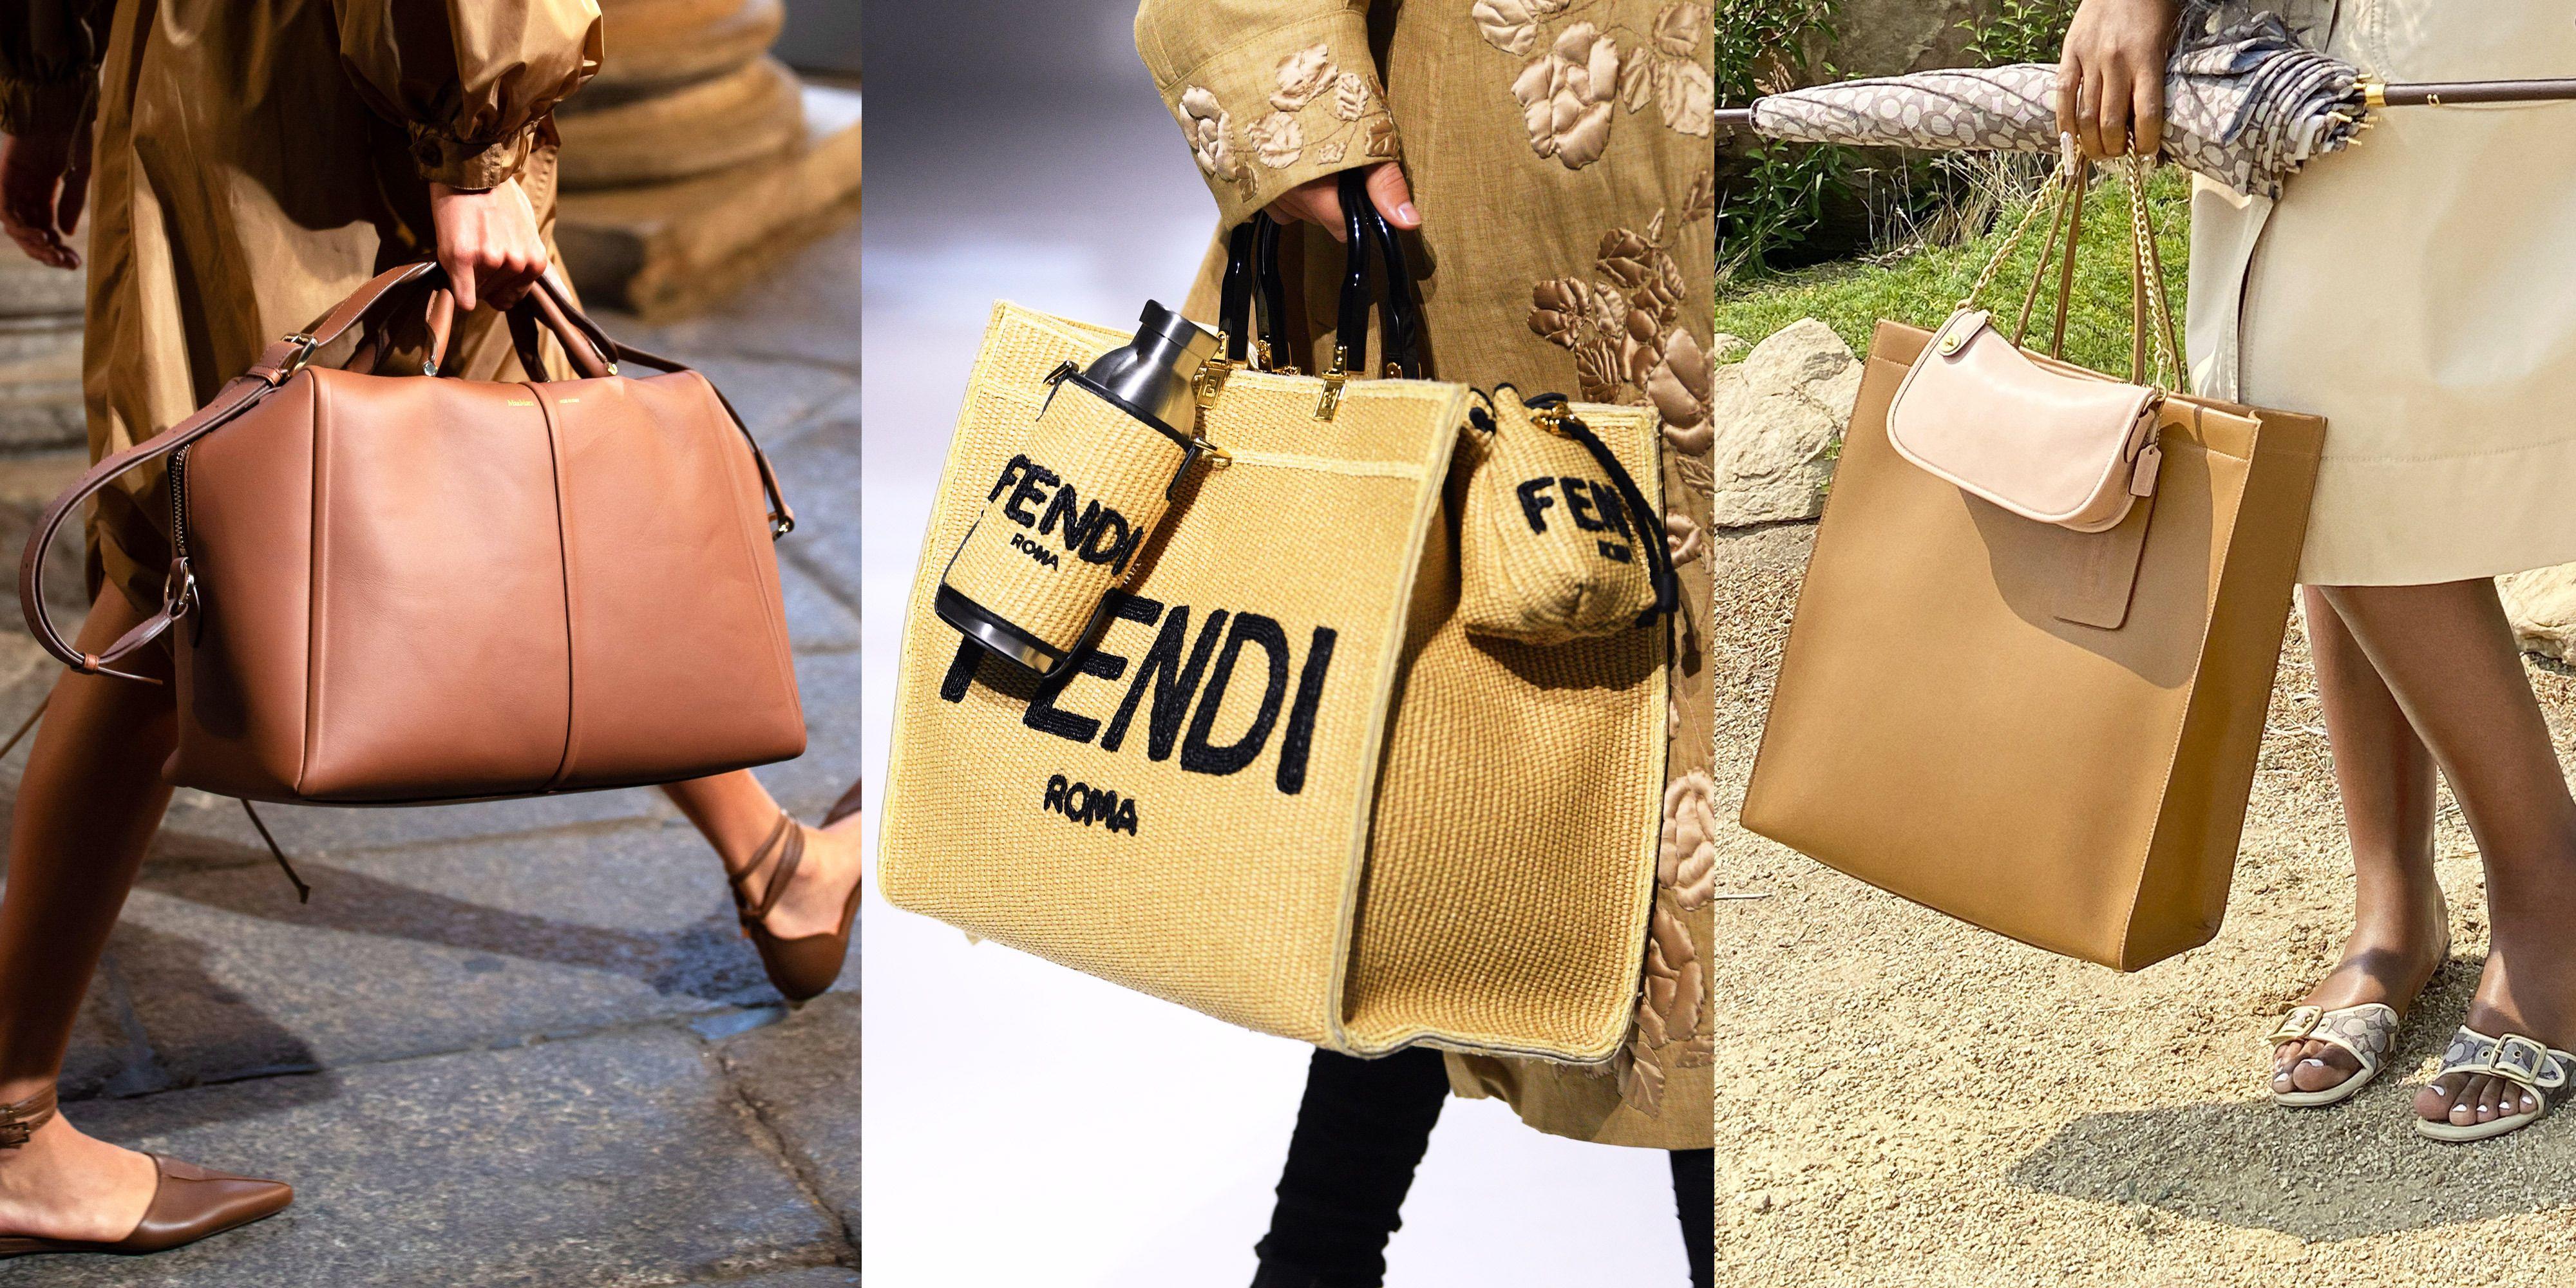 Wife gift Shopper bag Brown leather bag Leather tote bag Shoulder bag Women leather bag Girlfriend gift